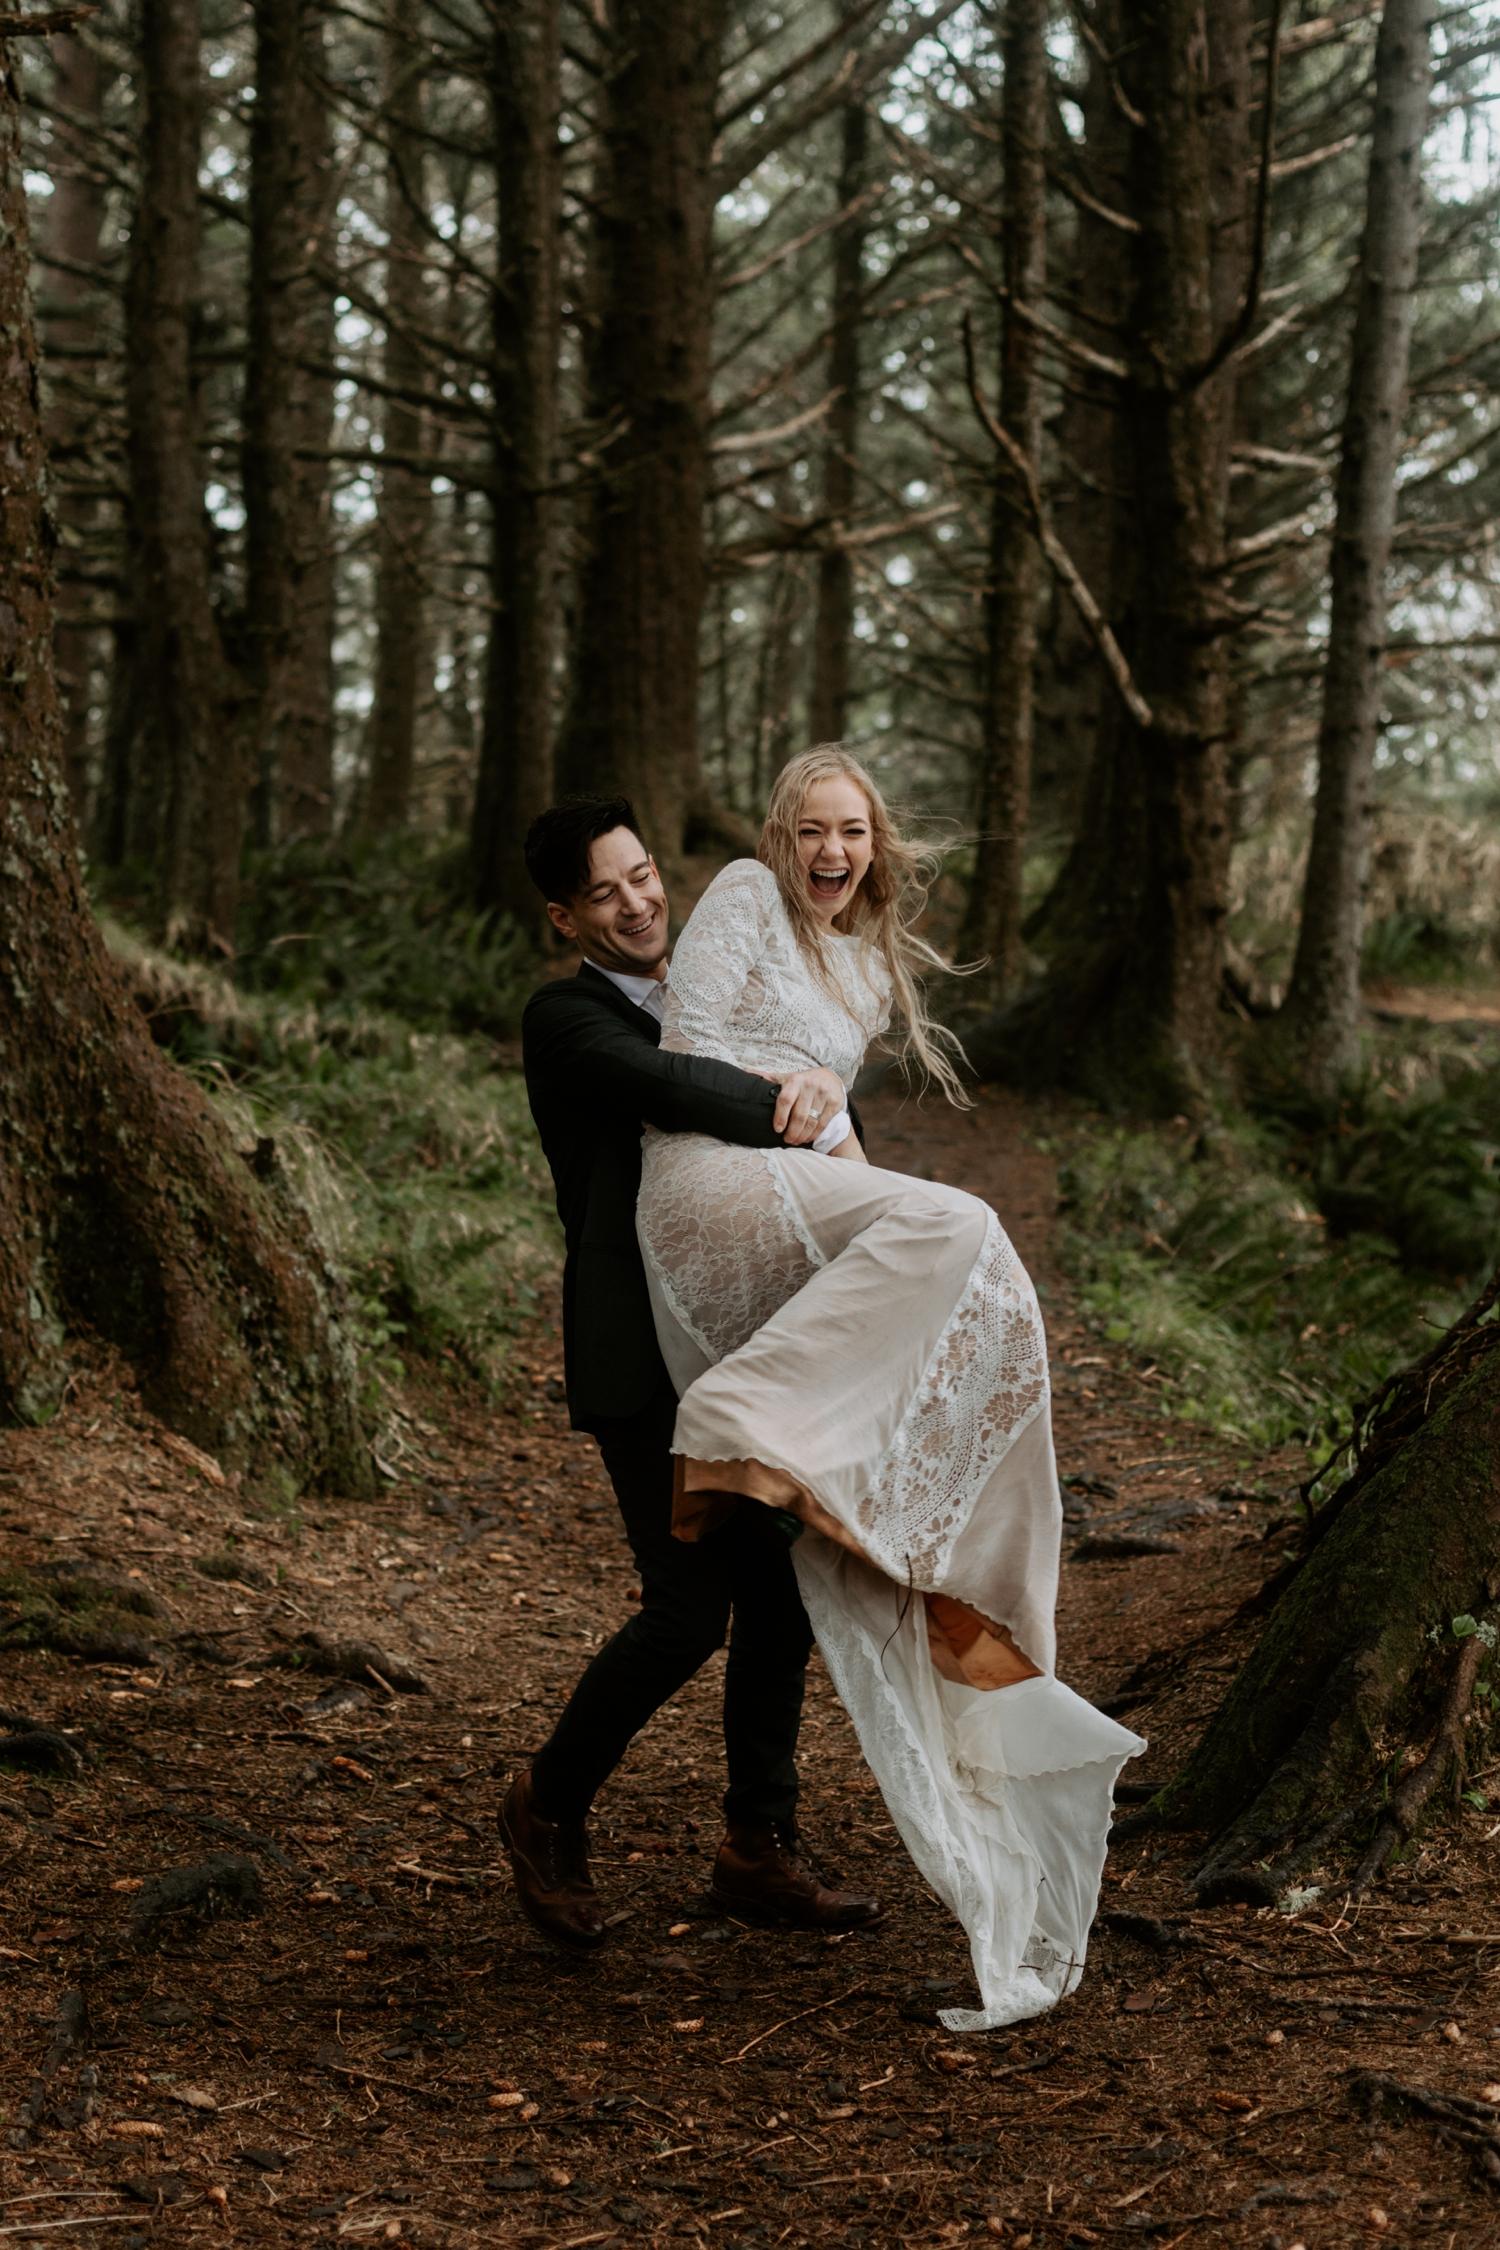 pnw-adventure-wedding-photographer-2018-05-02_0066.jpg